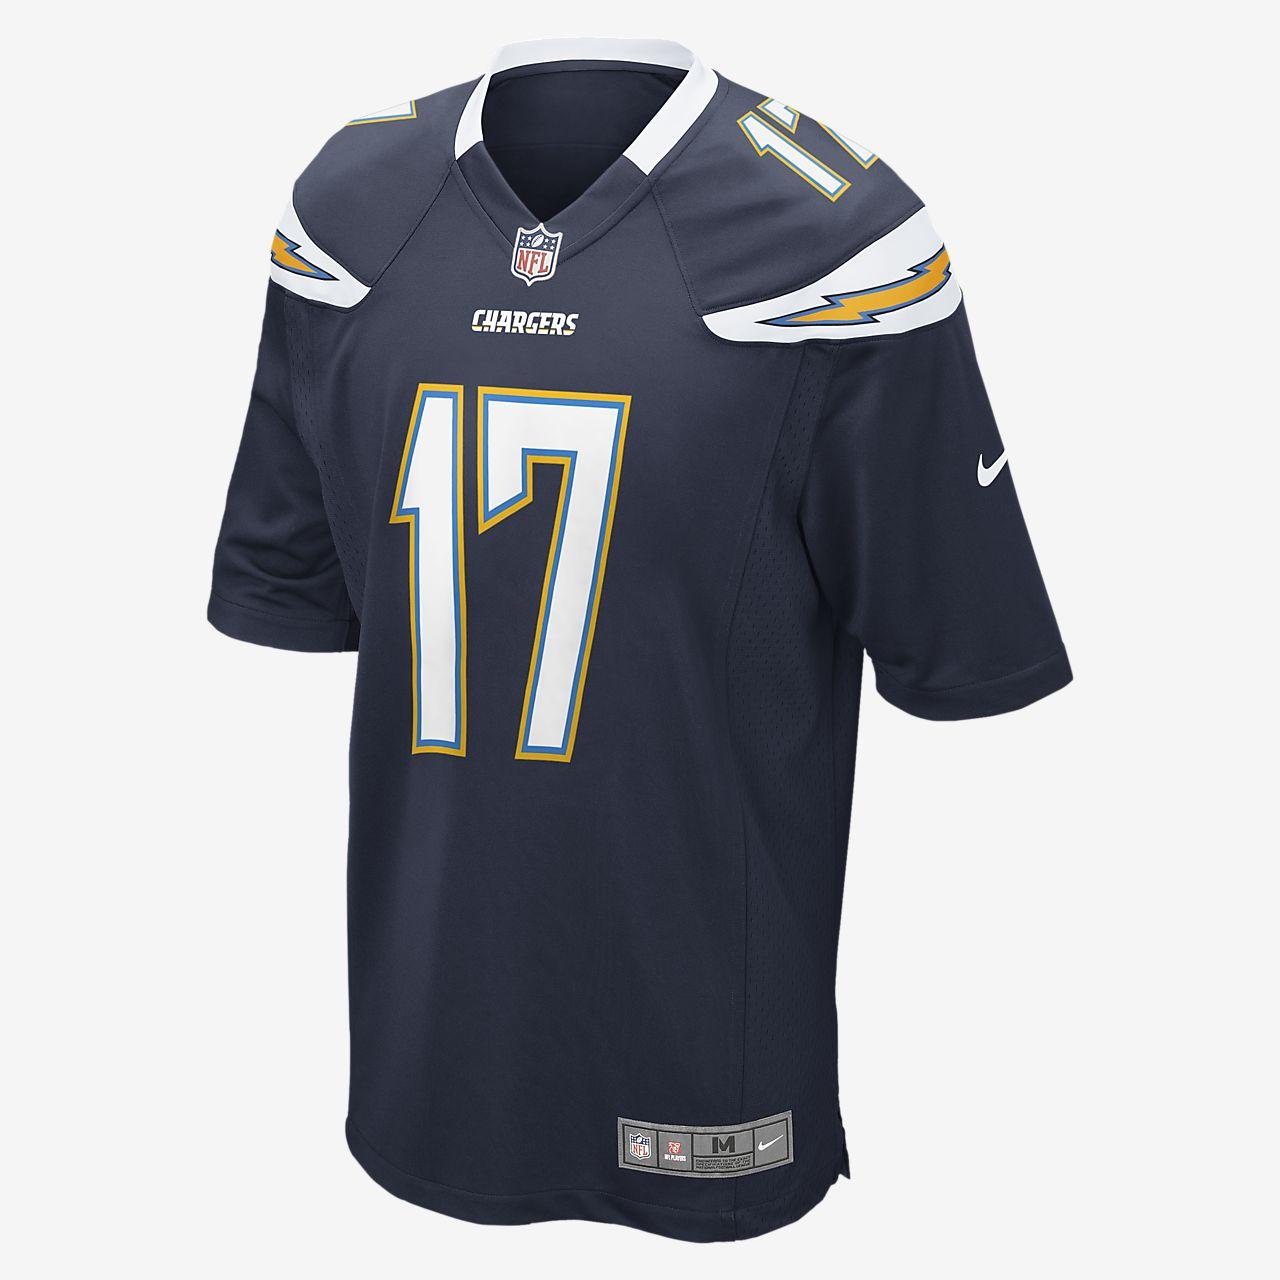 NFL Los Angeles Chargers (Philip Rivers) hjemmedrakt til amerikansk fotball for herre